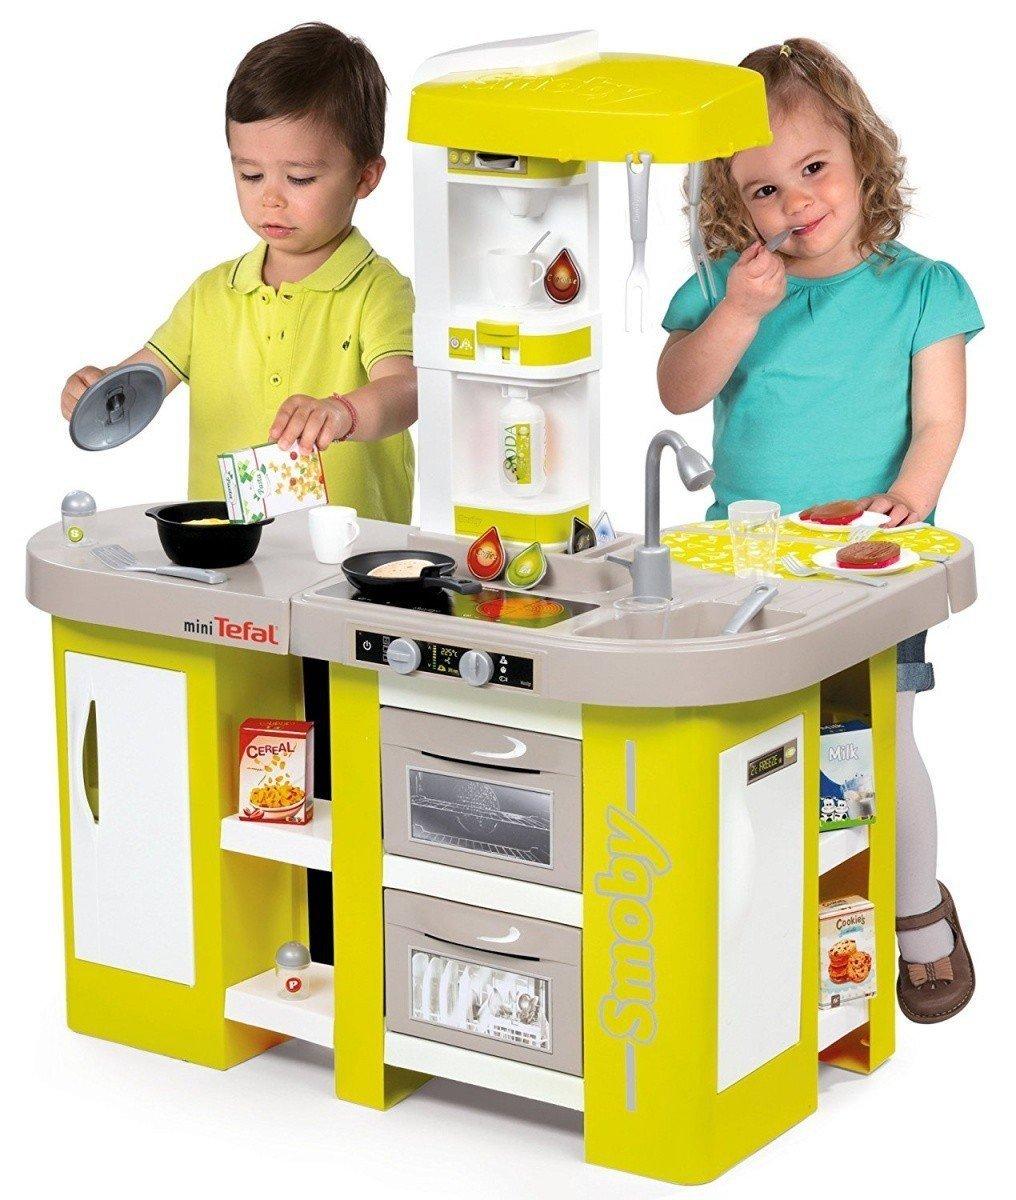 Smoby Kuchnia Mini Tefal Studio Xxl 311024 3 Kuchnie